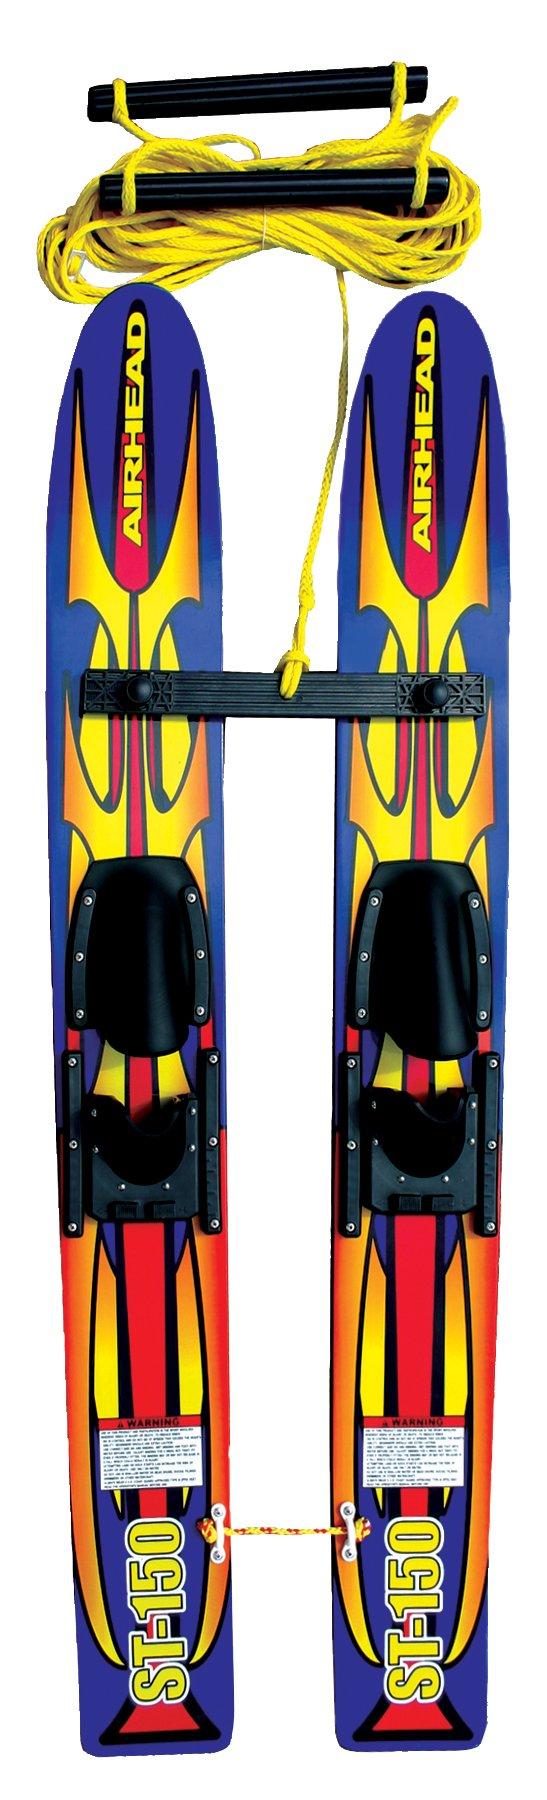 AIRHEAD AHST-150 Trainer Water Skis